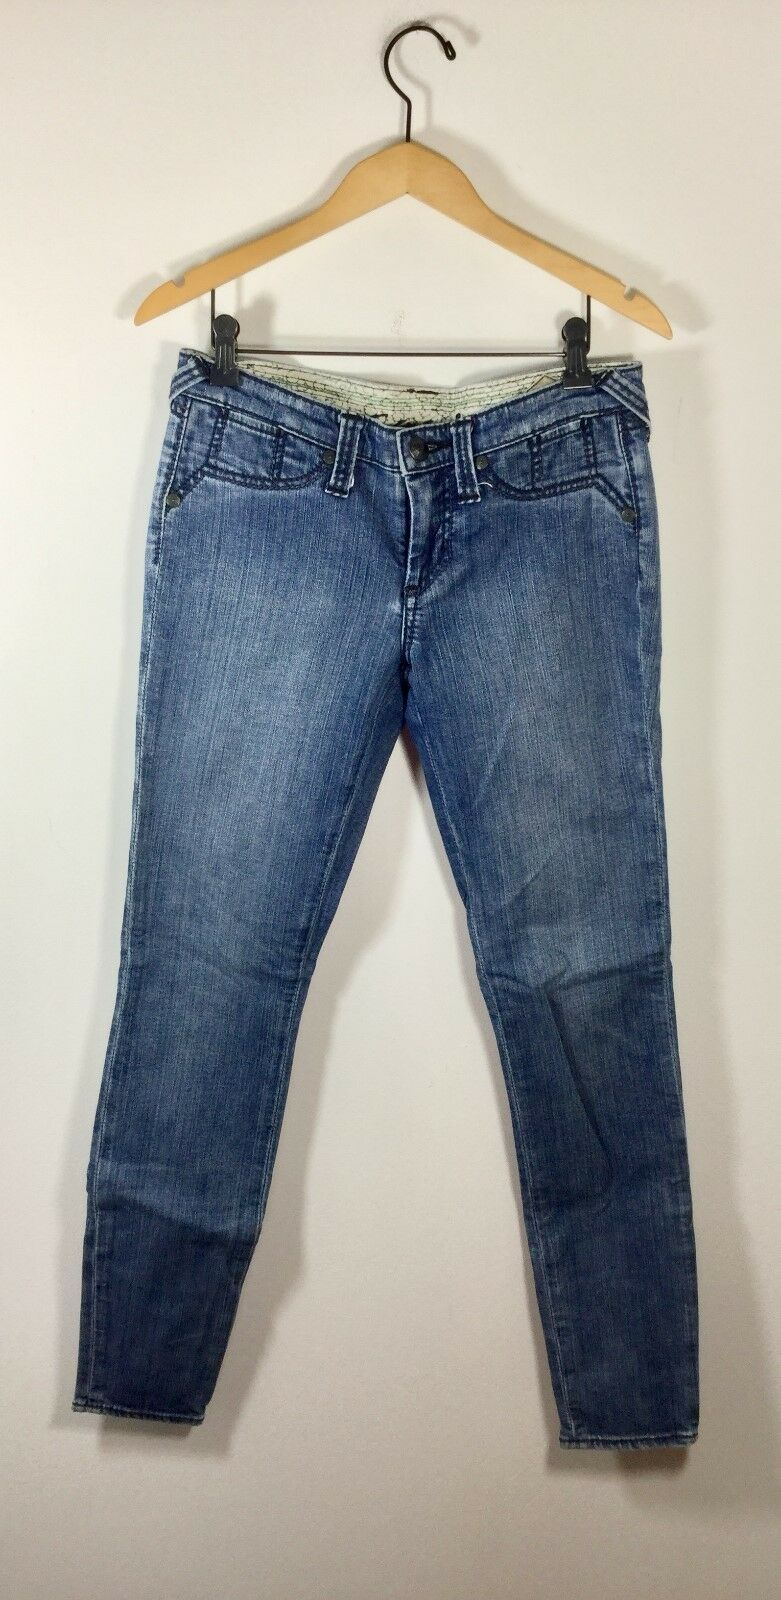 STITCH'S Medium bluee Grass Size 29 Skinny Leg  Moccasin  Denim Jean